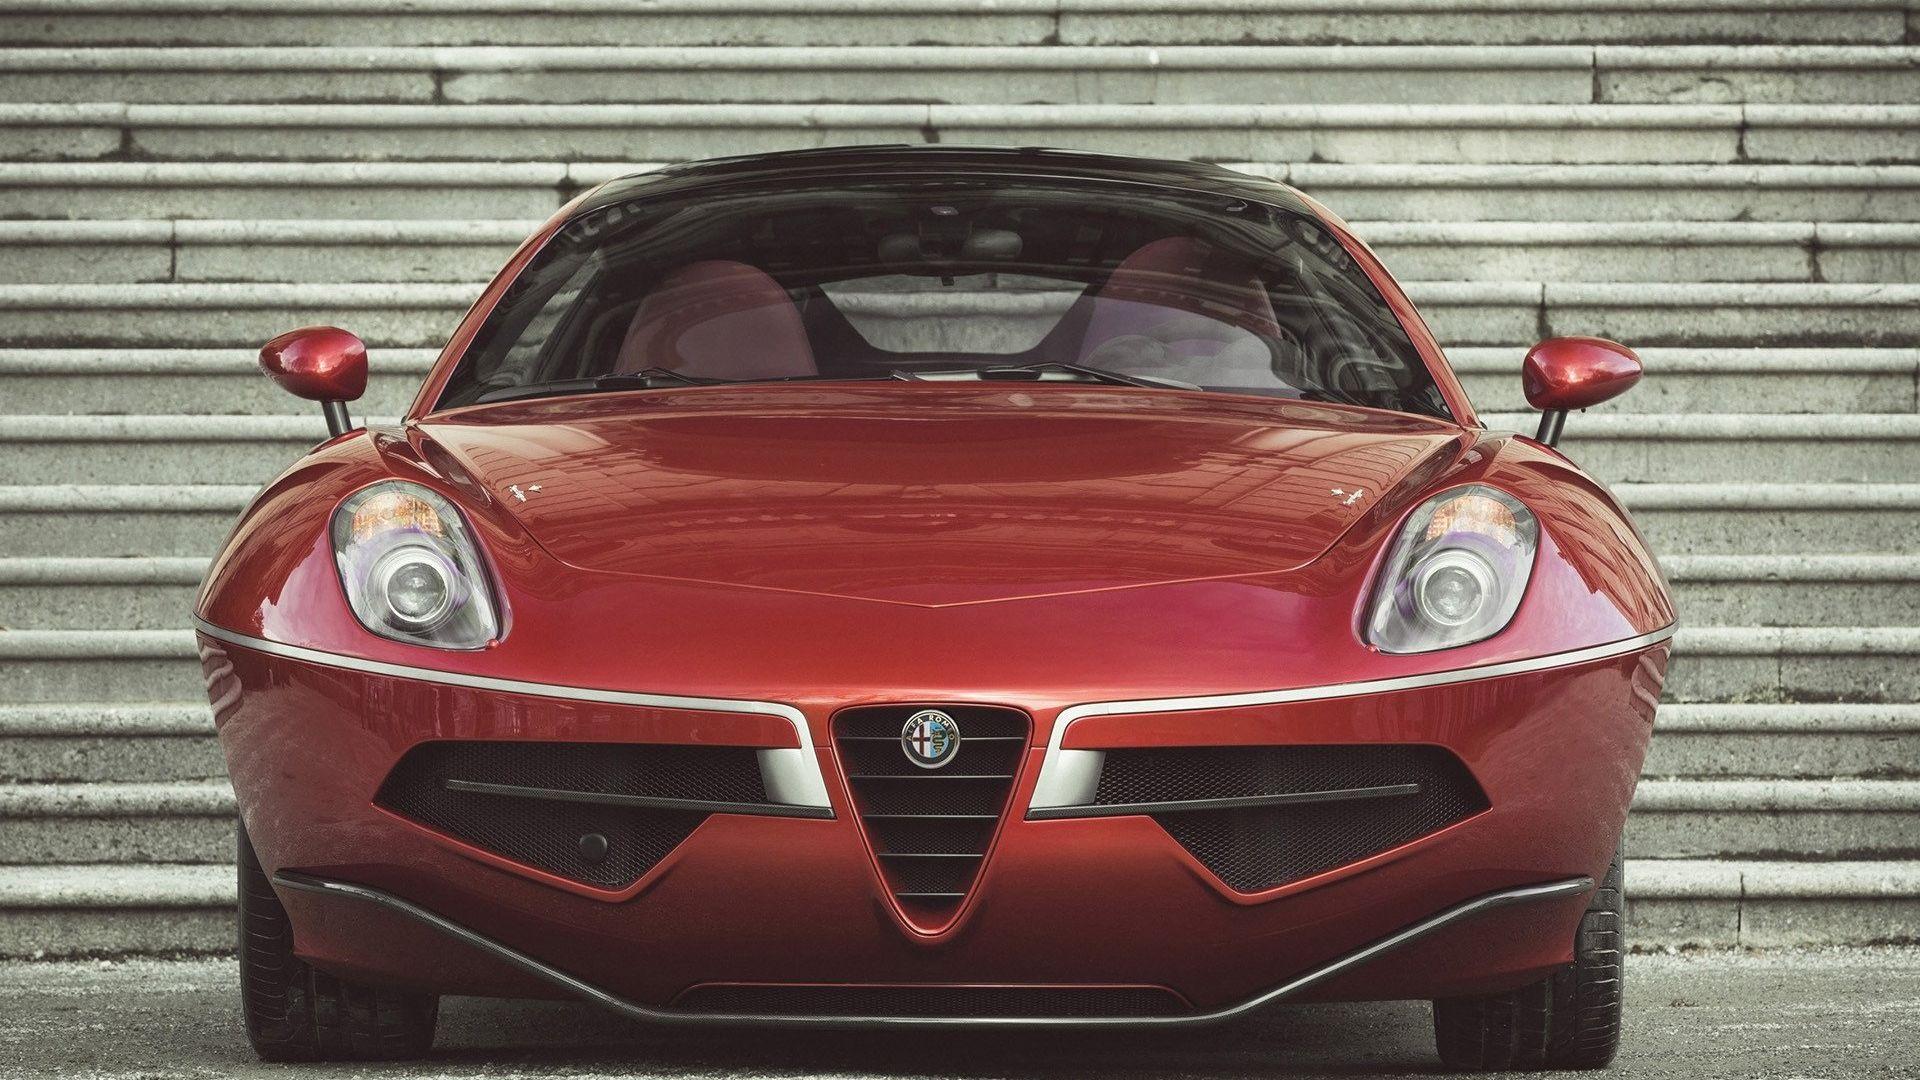 Wallpaper Alfa Romeo Disco Volante car, front view